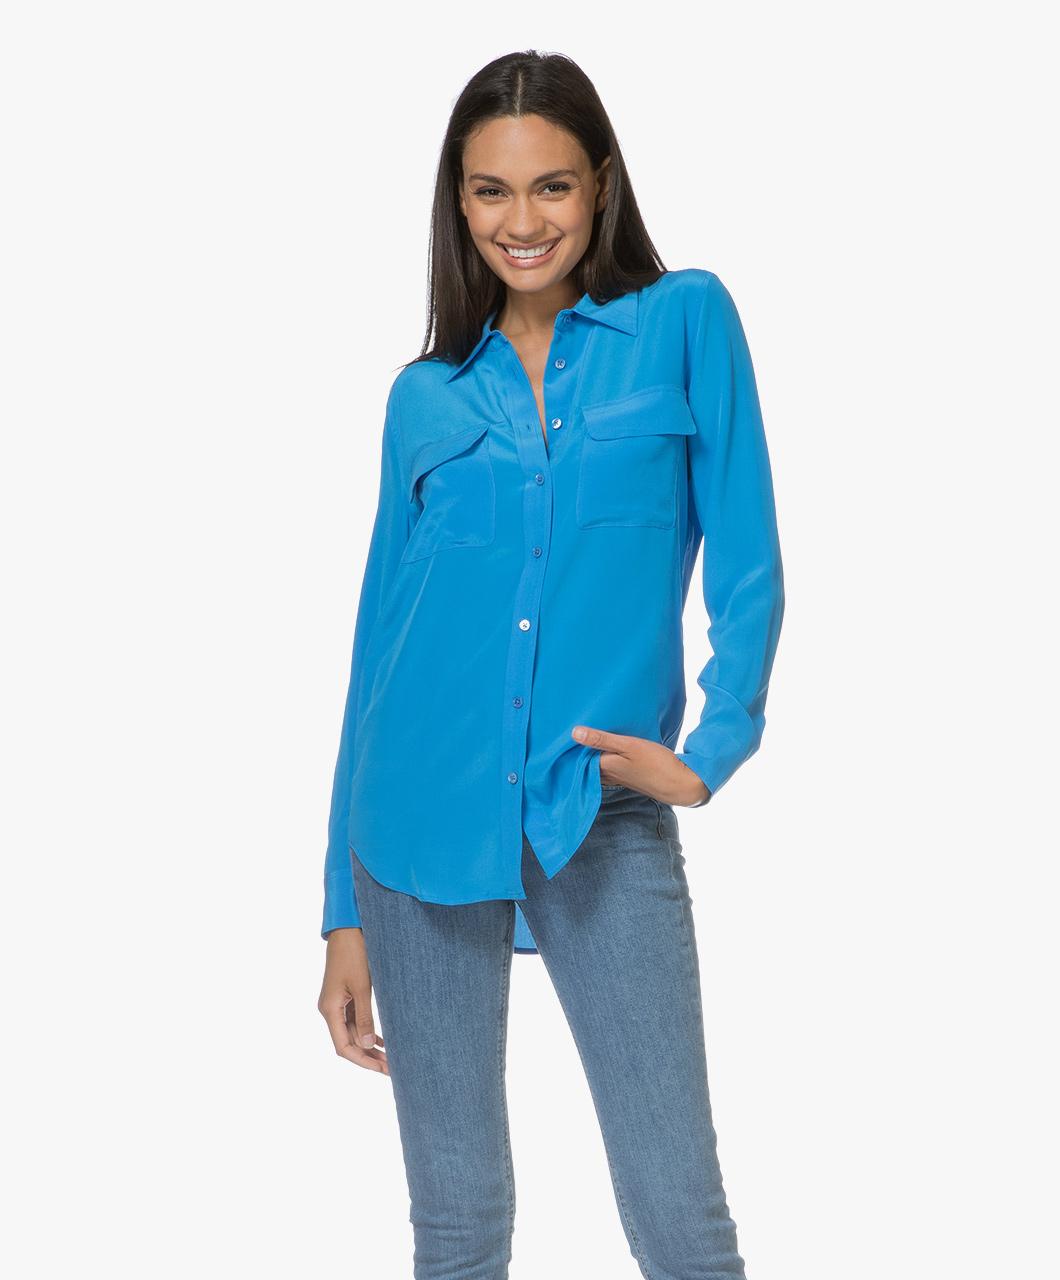 Afbeelding van Equipment Blouse Slim Signature Washed silk in Zwart Brilliant Blauw